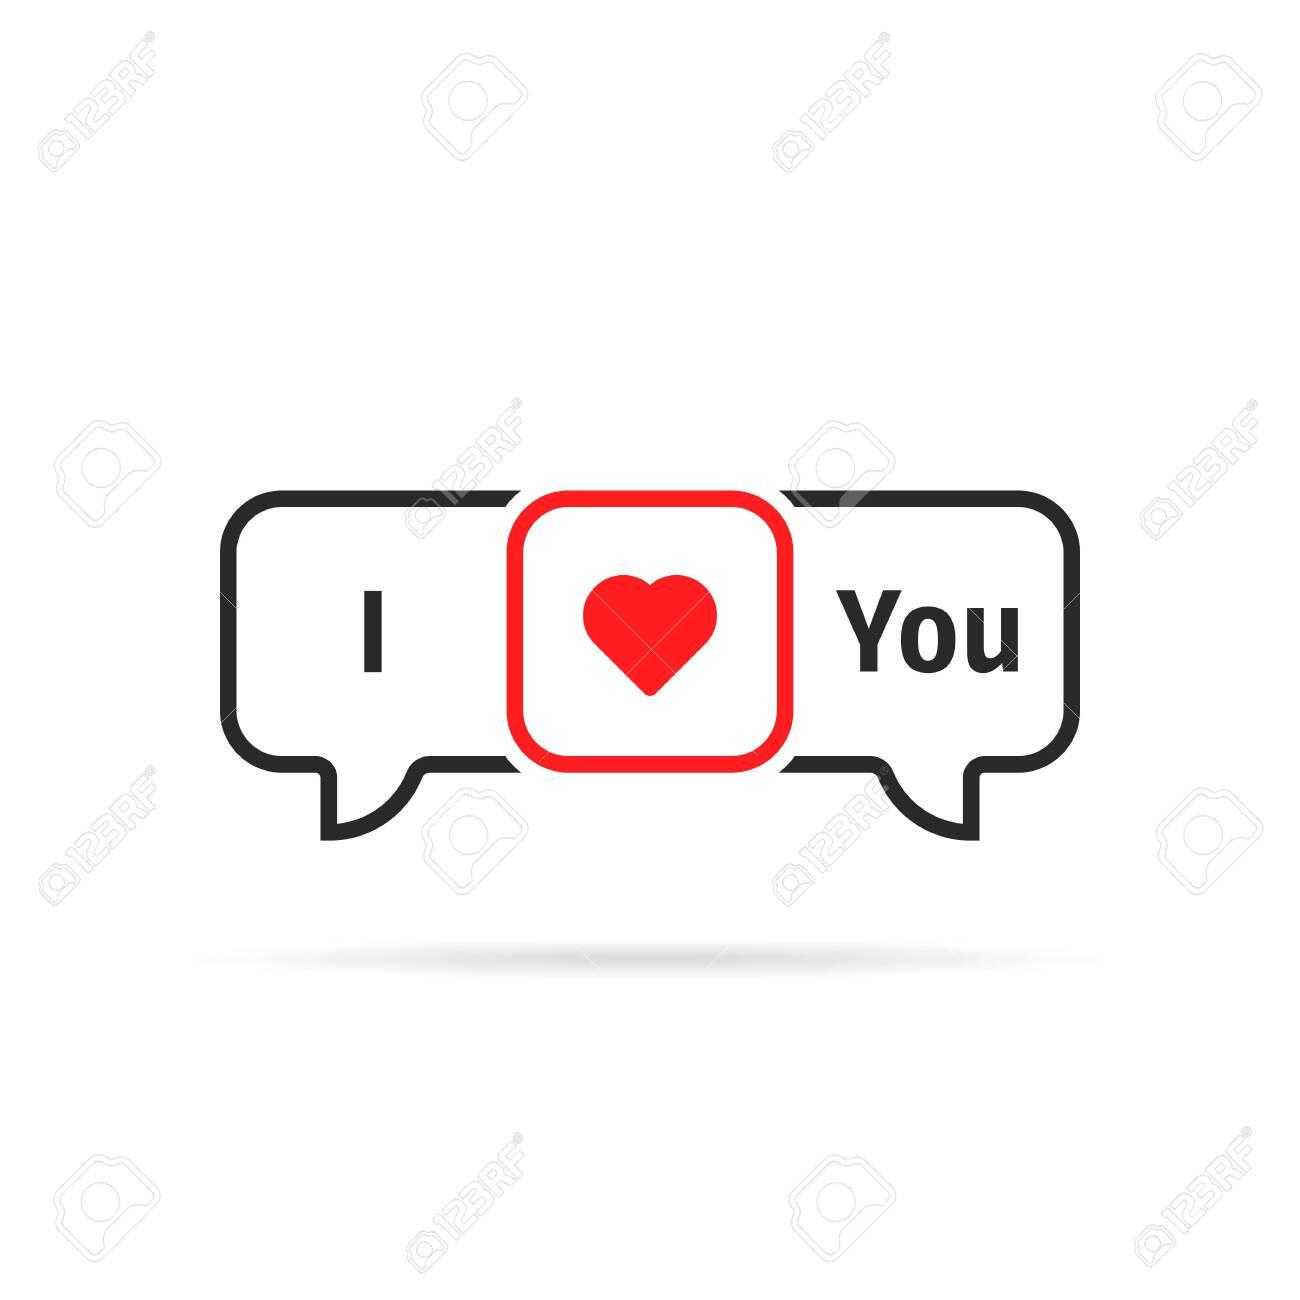 Login 123 love chat Free Live